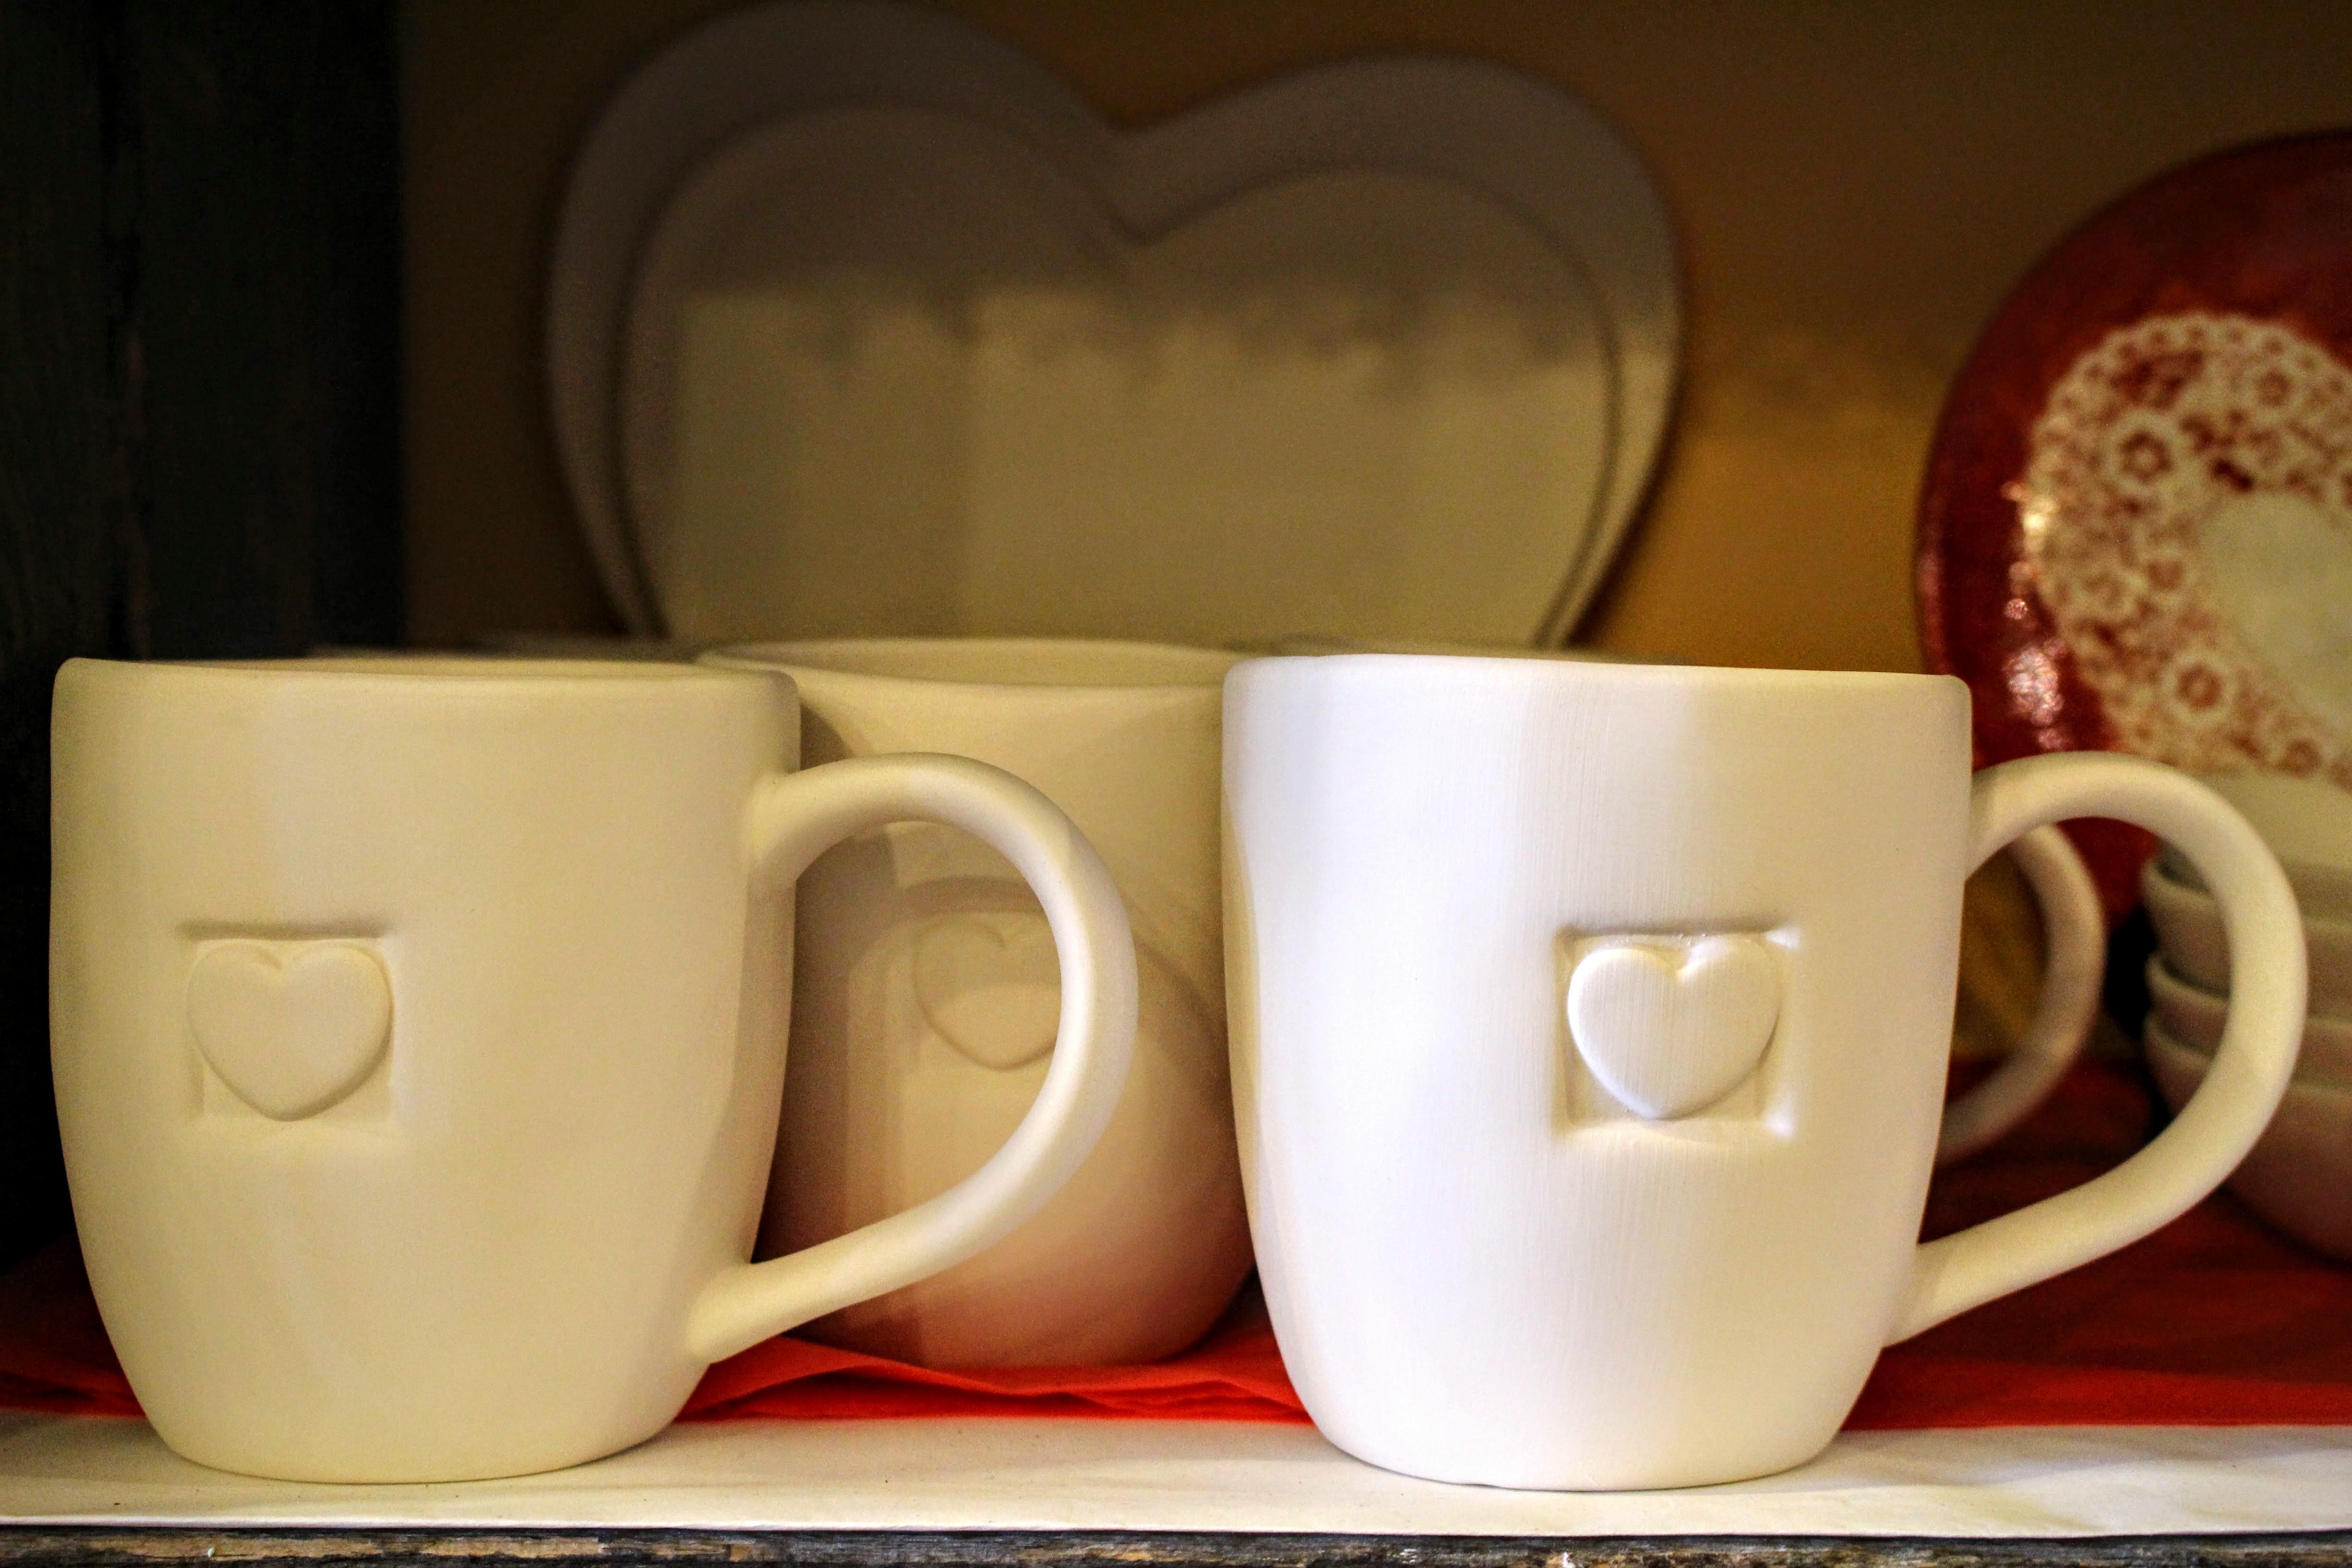 Heart mugs